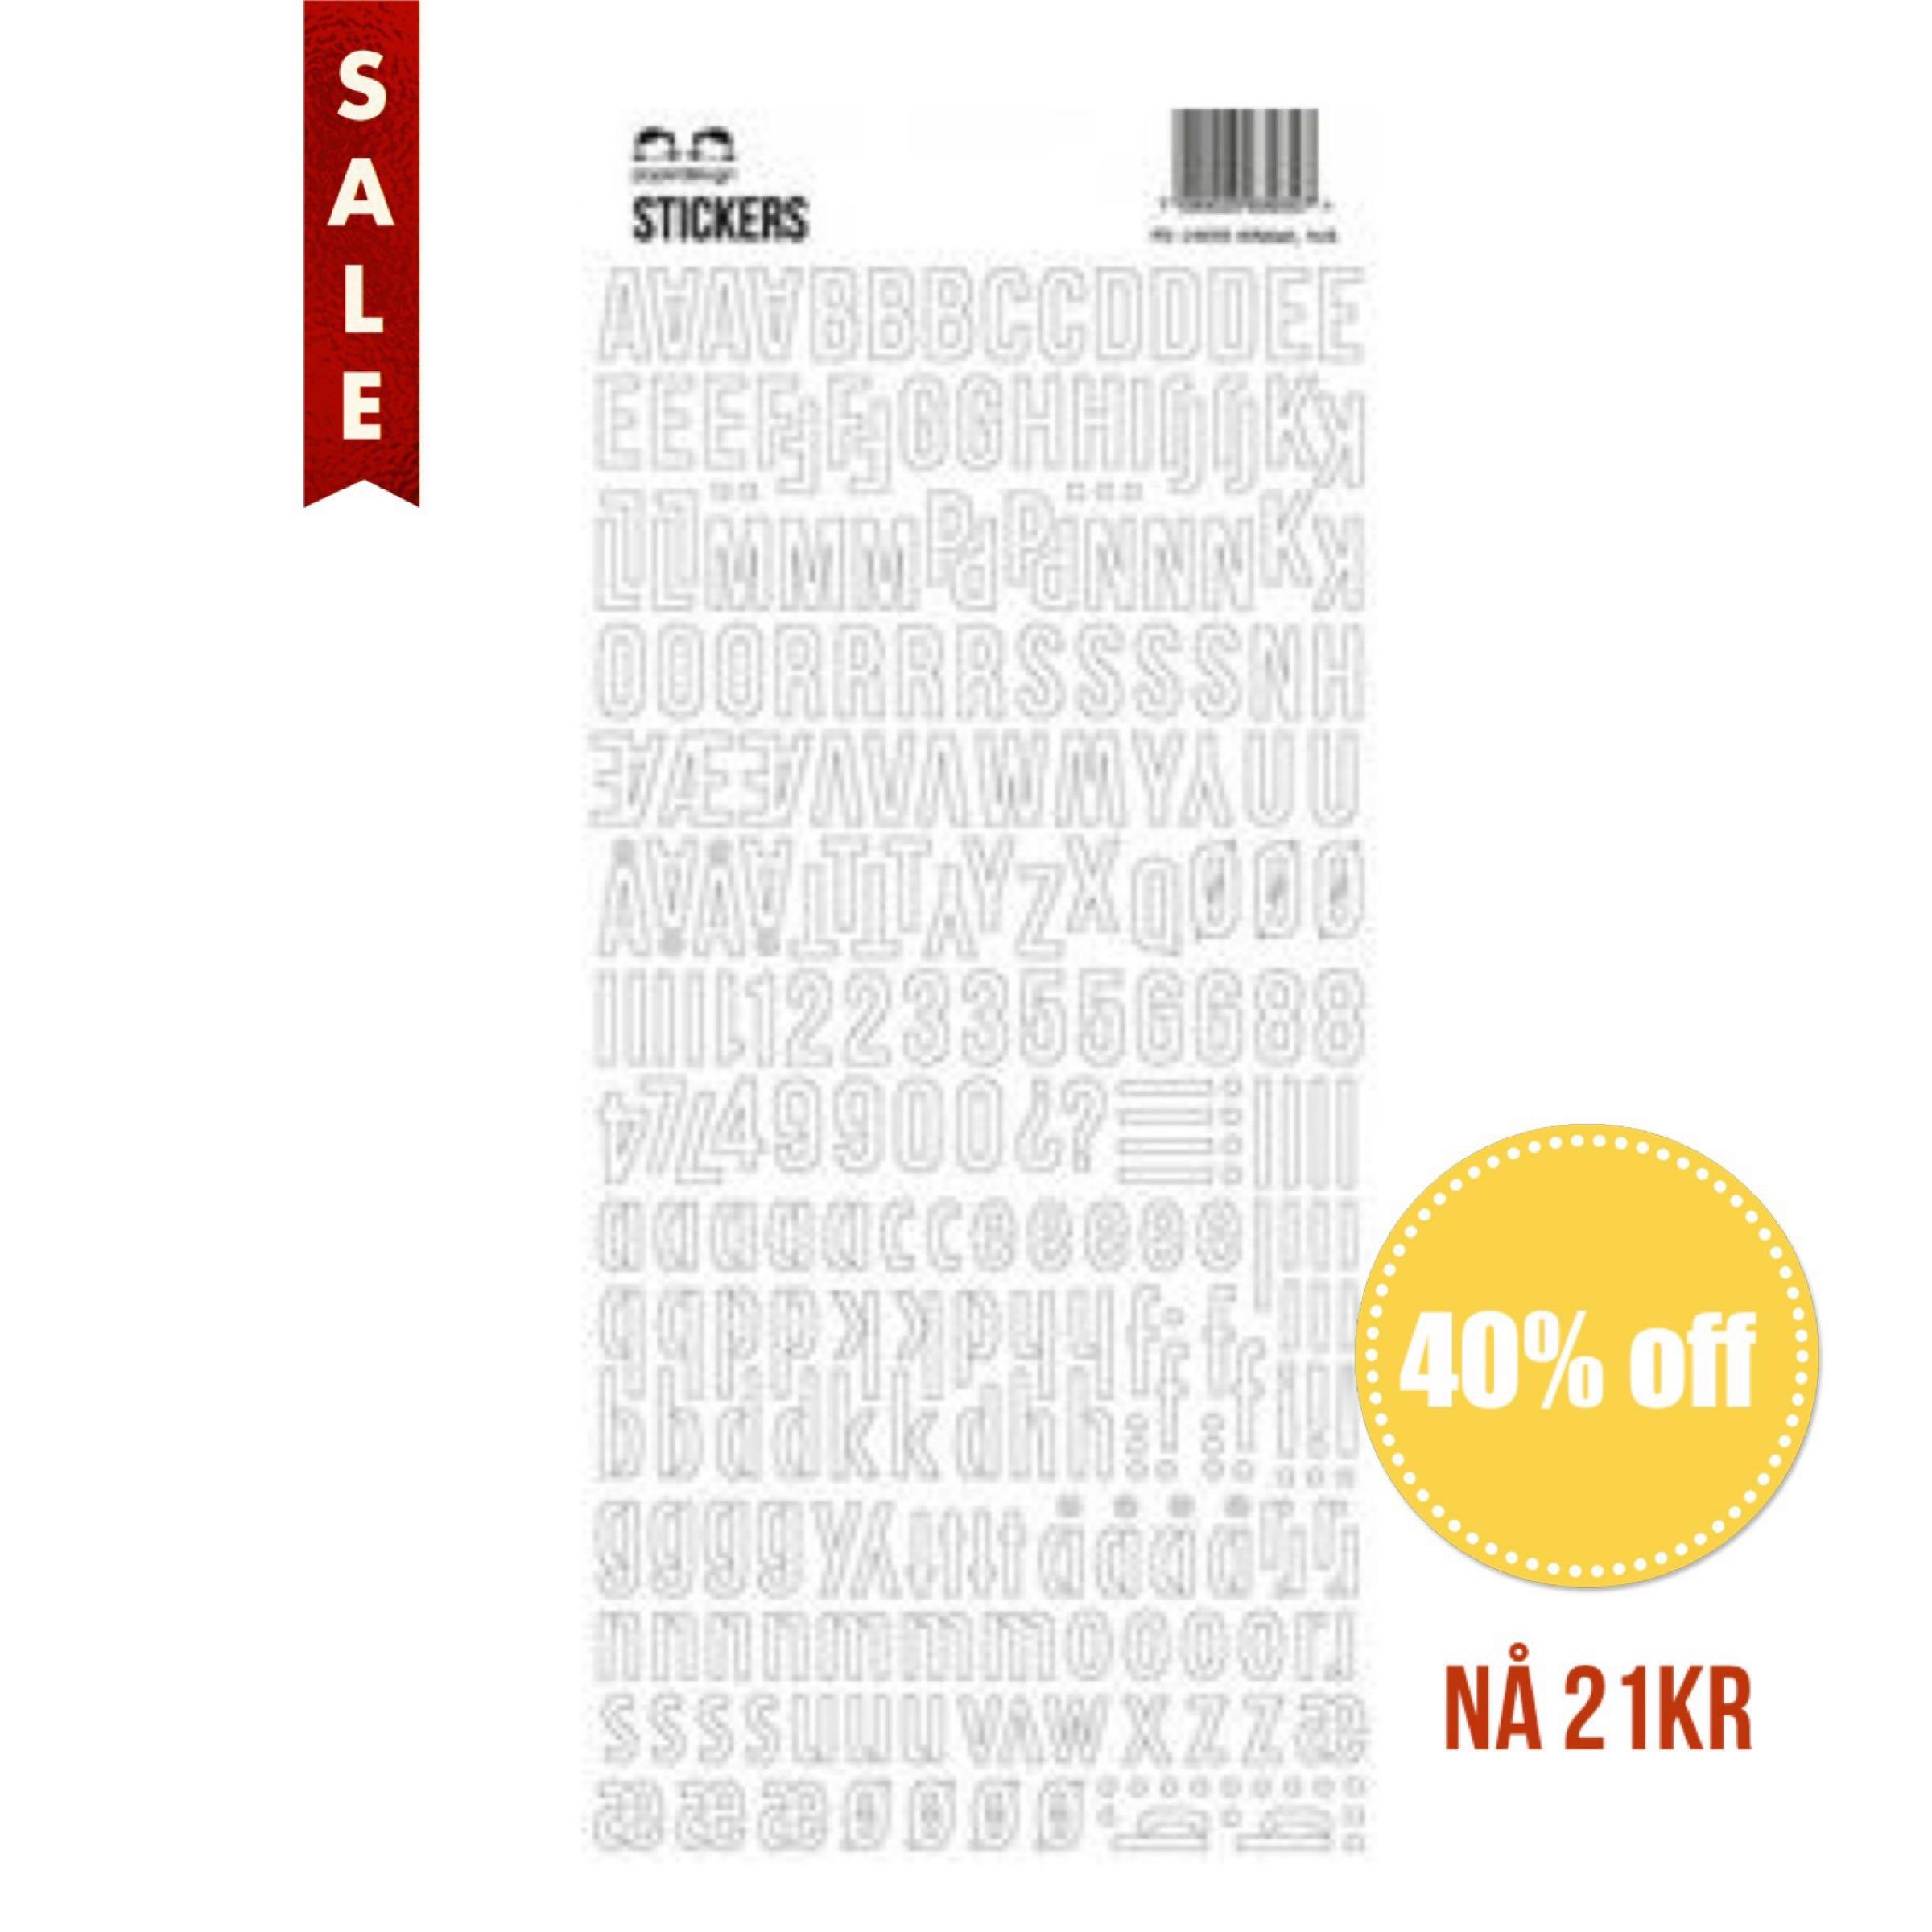 Papirdesign Alphabet Stickers / Klistremerker Alfabet - Stor Hvit / Large White